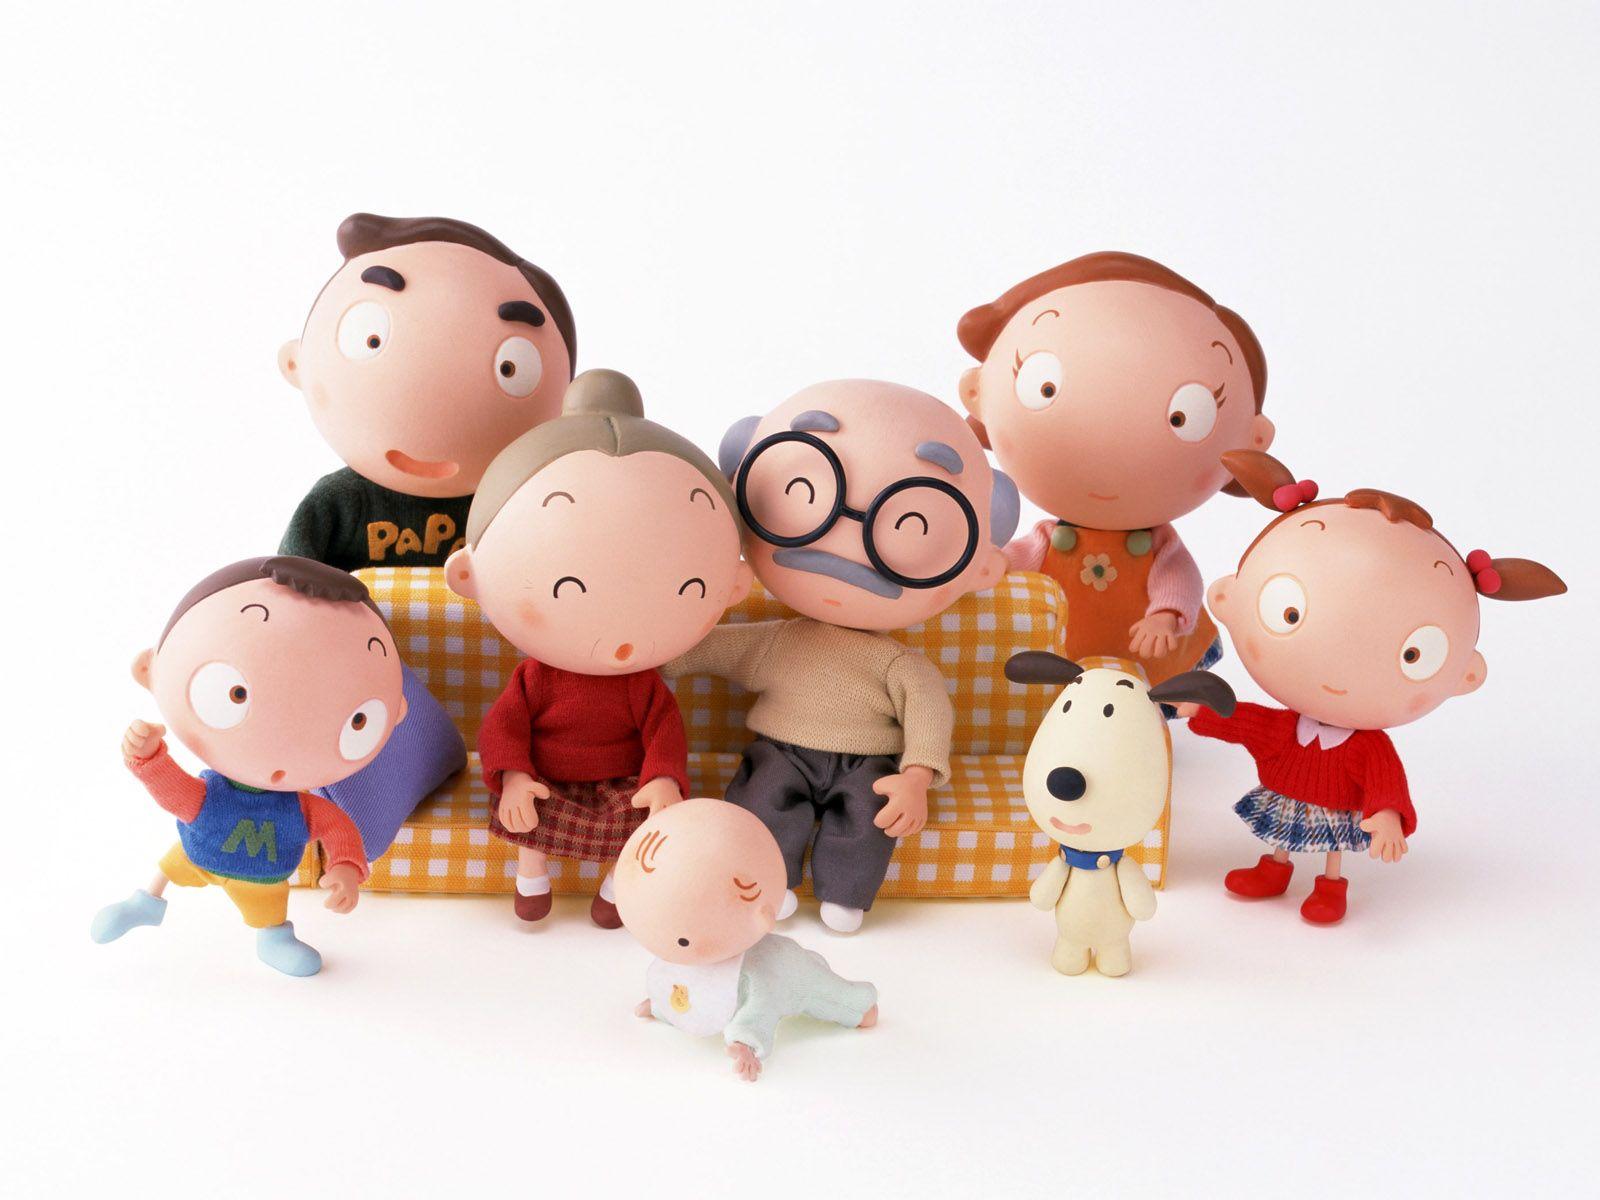 Happy Family Life Cute Cartoon Wallpaper #112492 - Resolution 1600x1200 px